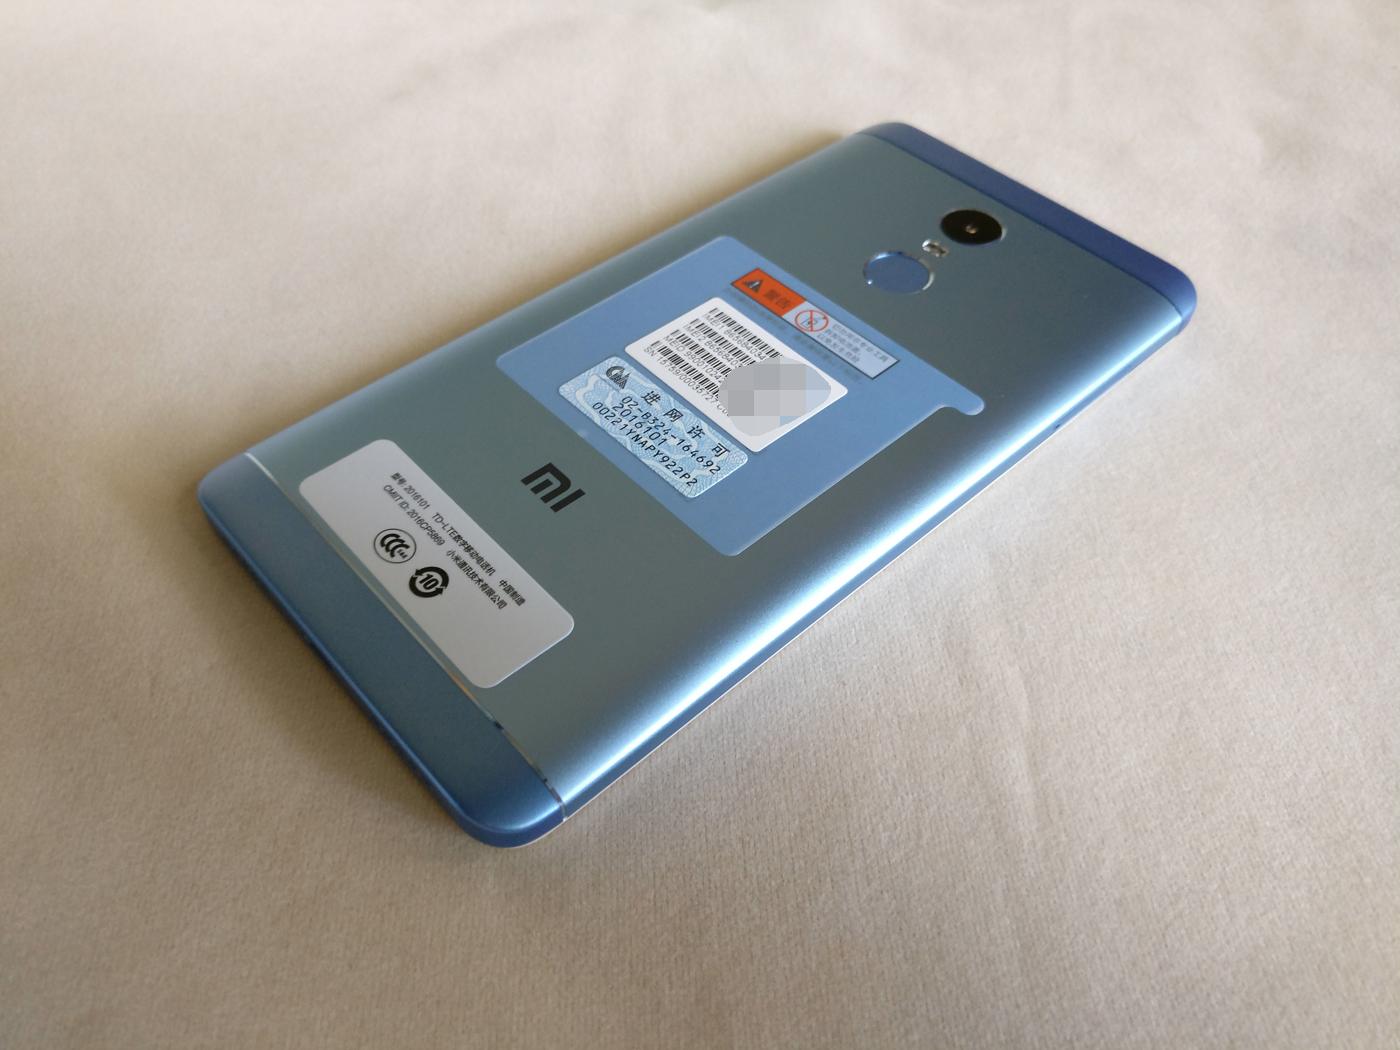 To2ccom Blog June 2017 Xiaomi Redmi Note 5 Pro Ram 6gb Rom 64gb New Original The Details Of 4x Being Photographed Colorlight Blue Ram3gb Rom32gb